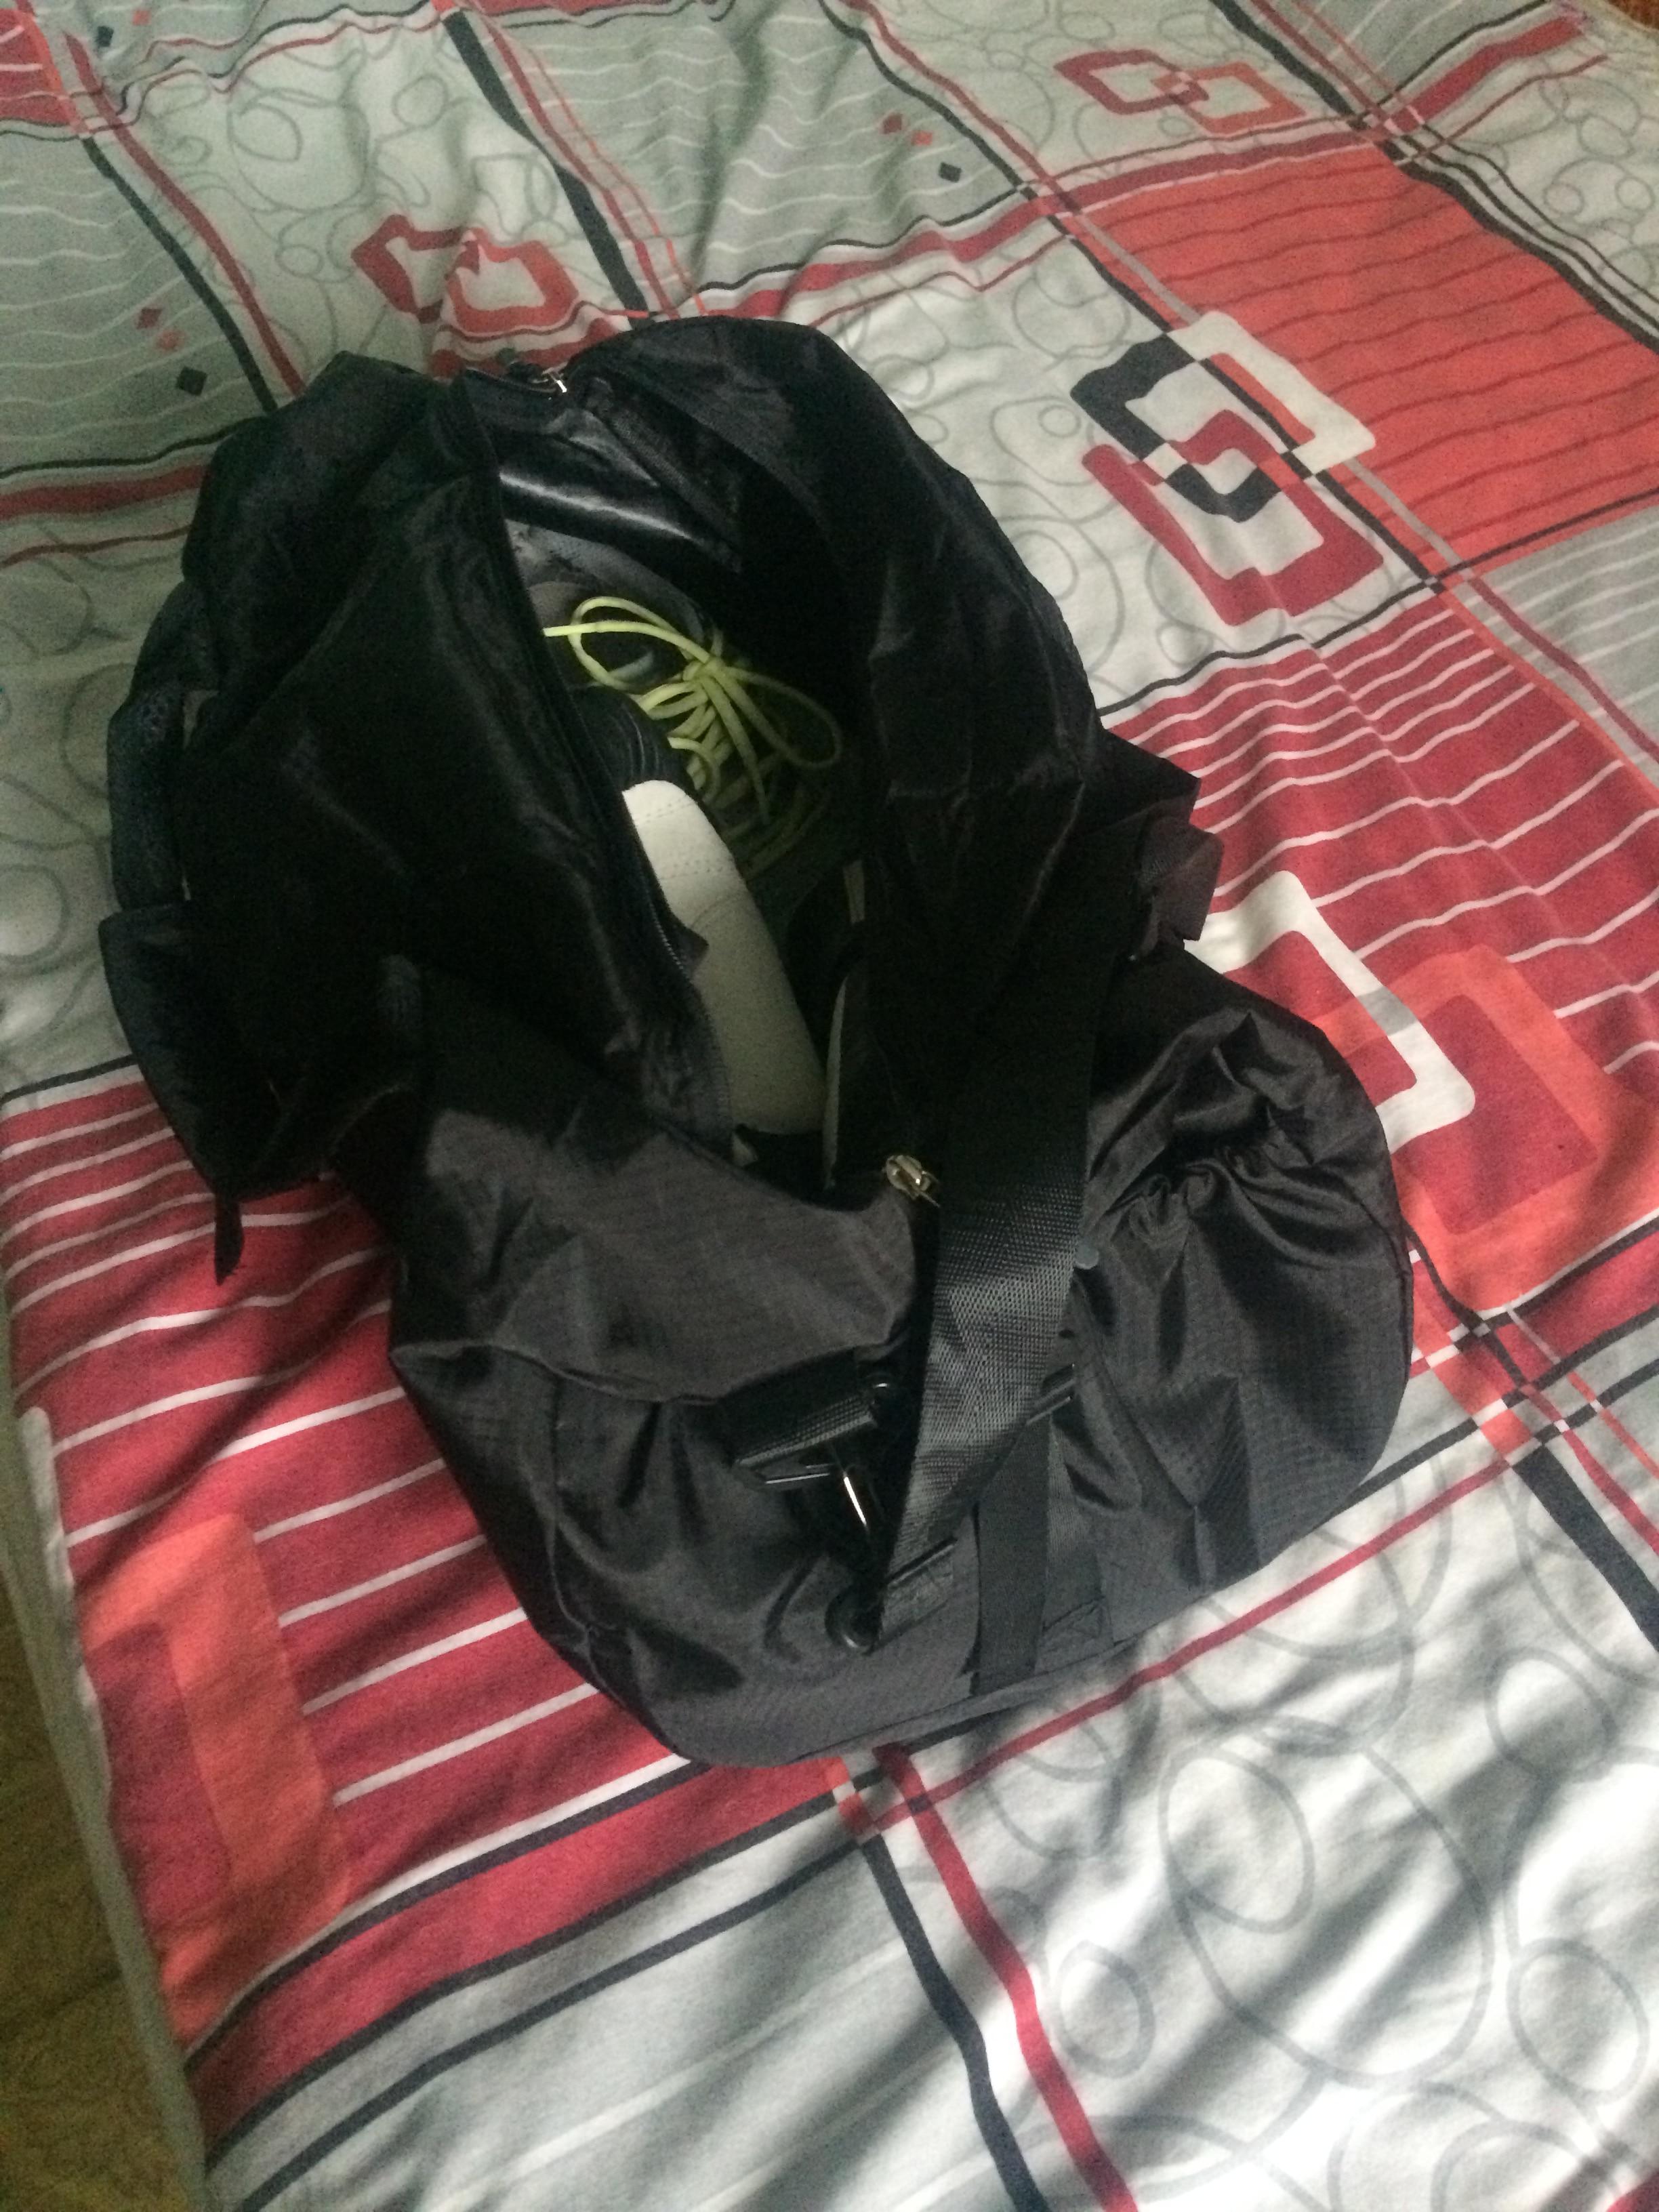 Scione Waterproof Travel Bag Multifunction Travel Duffle Bags for Men & Women Collapsible Bag Large Capacity Duffel Folding Bags photo review